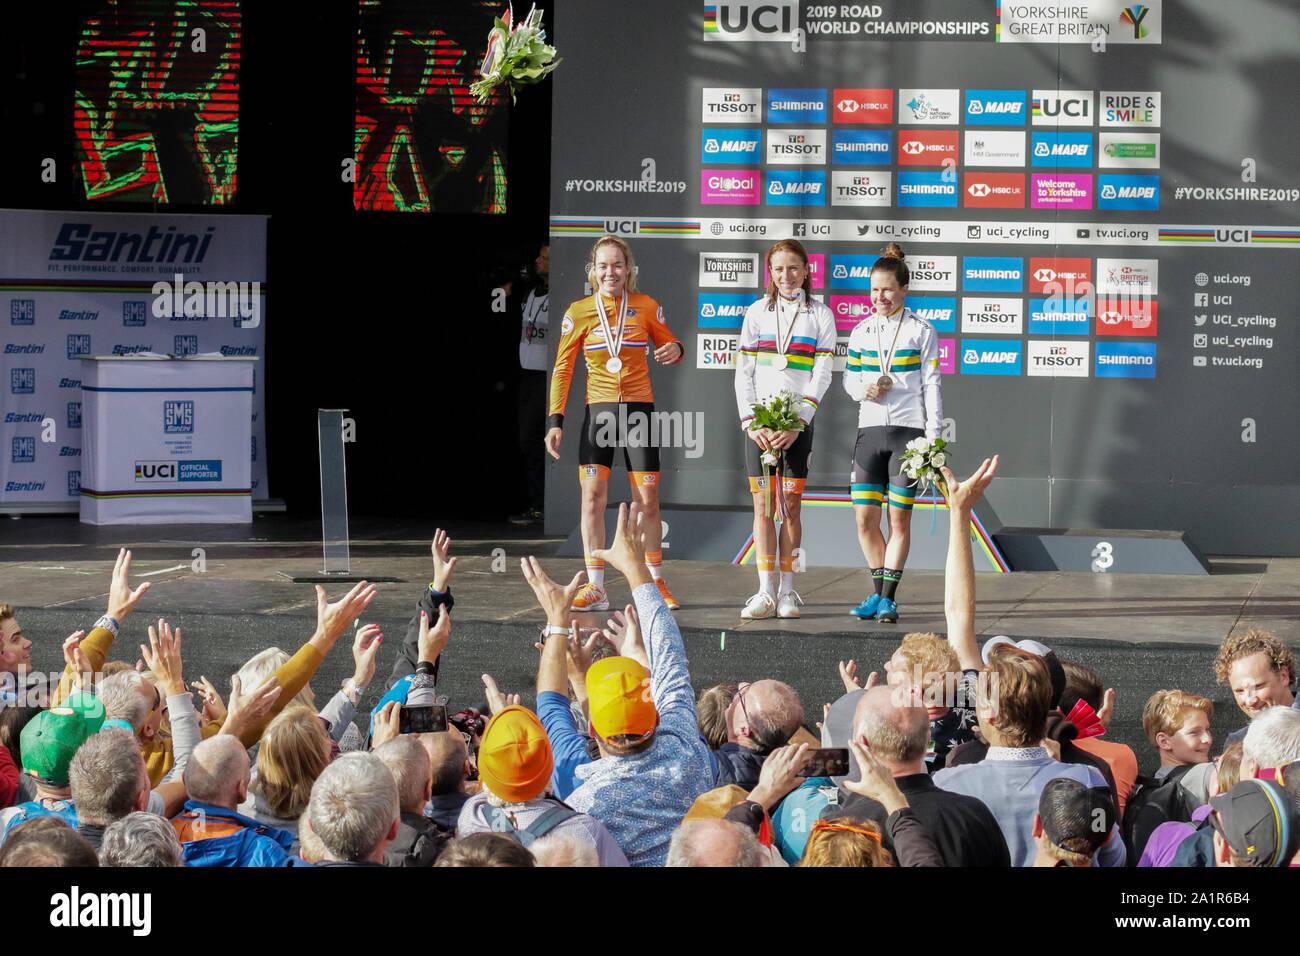 Harrogate, UK. 28th Sep, 2019. Annemiek Van Vleuten of the Netherlands takes Gold Anna Van Der Breggen also of the Netherlands takes Silver and Amanda Spratt of Australia takes Bronze in the 2019 UCI Road World Championships Womens Elite Road Race. September 28, 2019 Credit Dan-Cooke/Alamy Live News Stock Photo